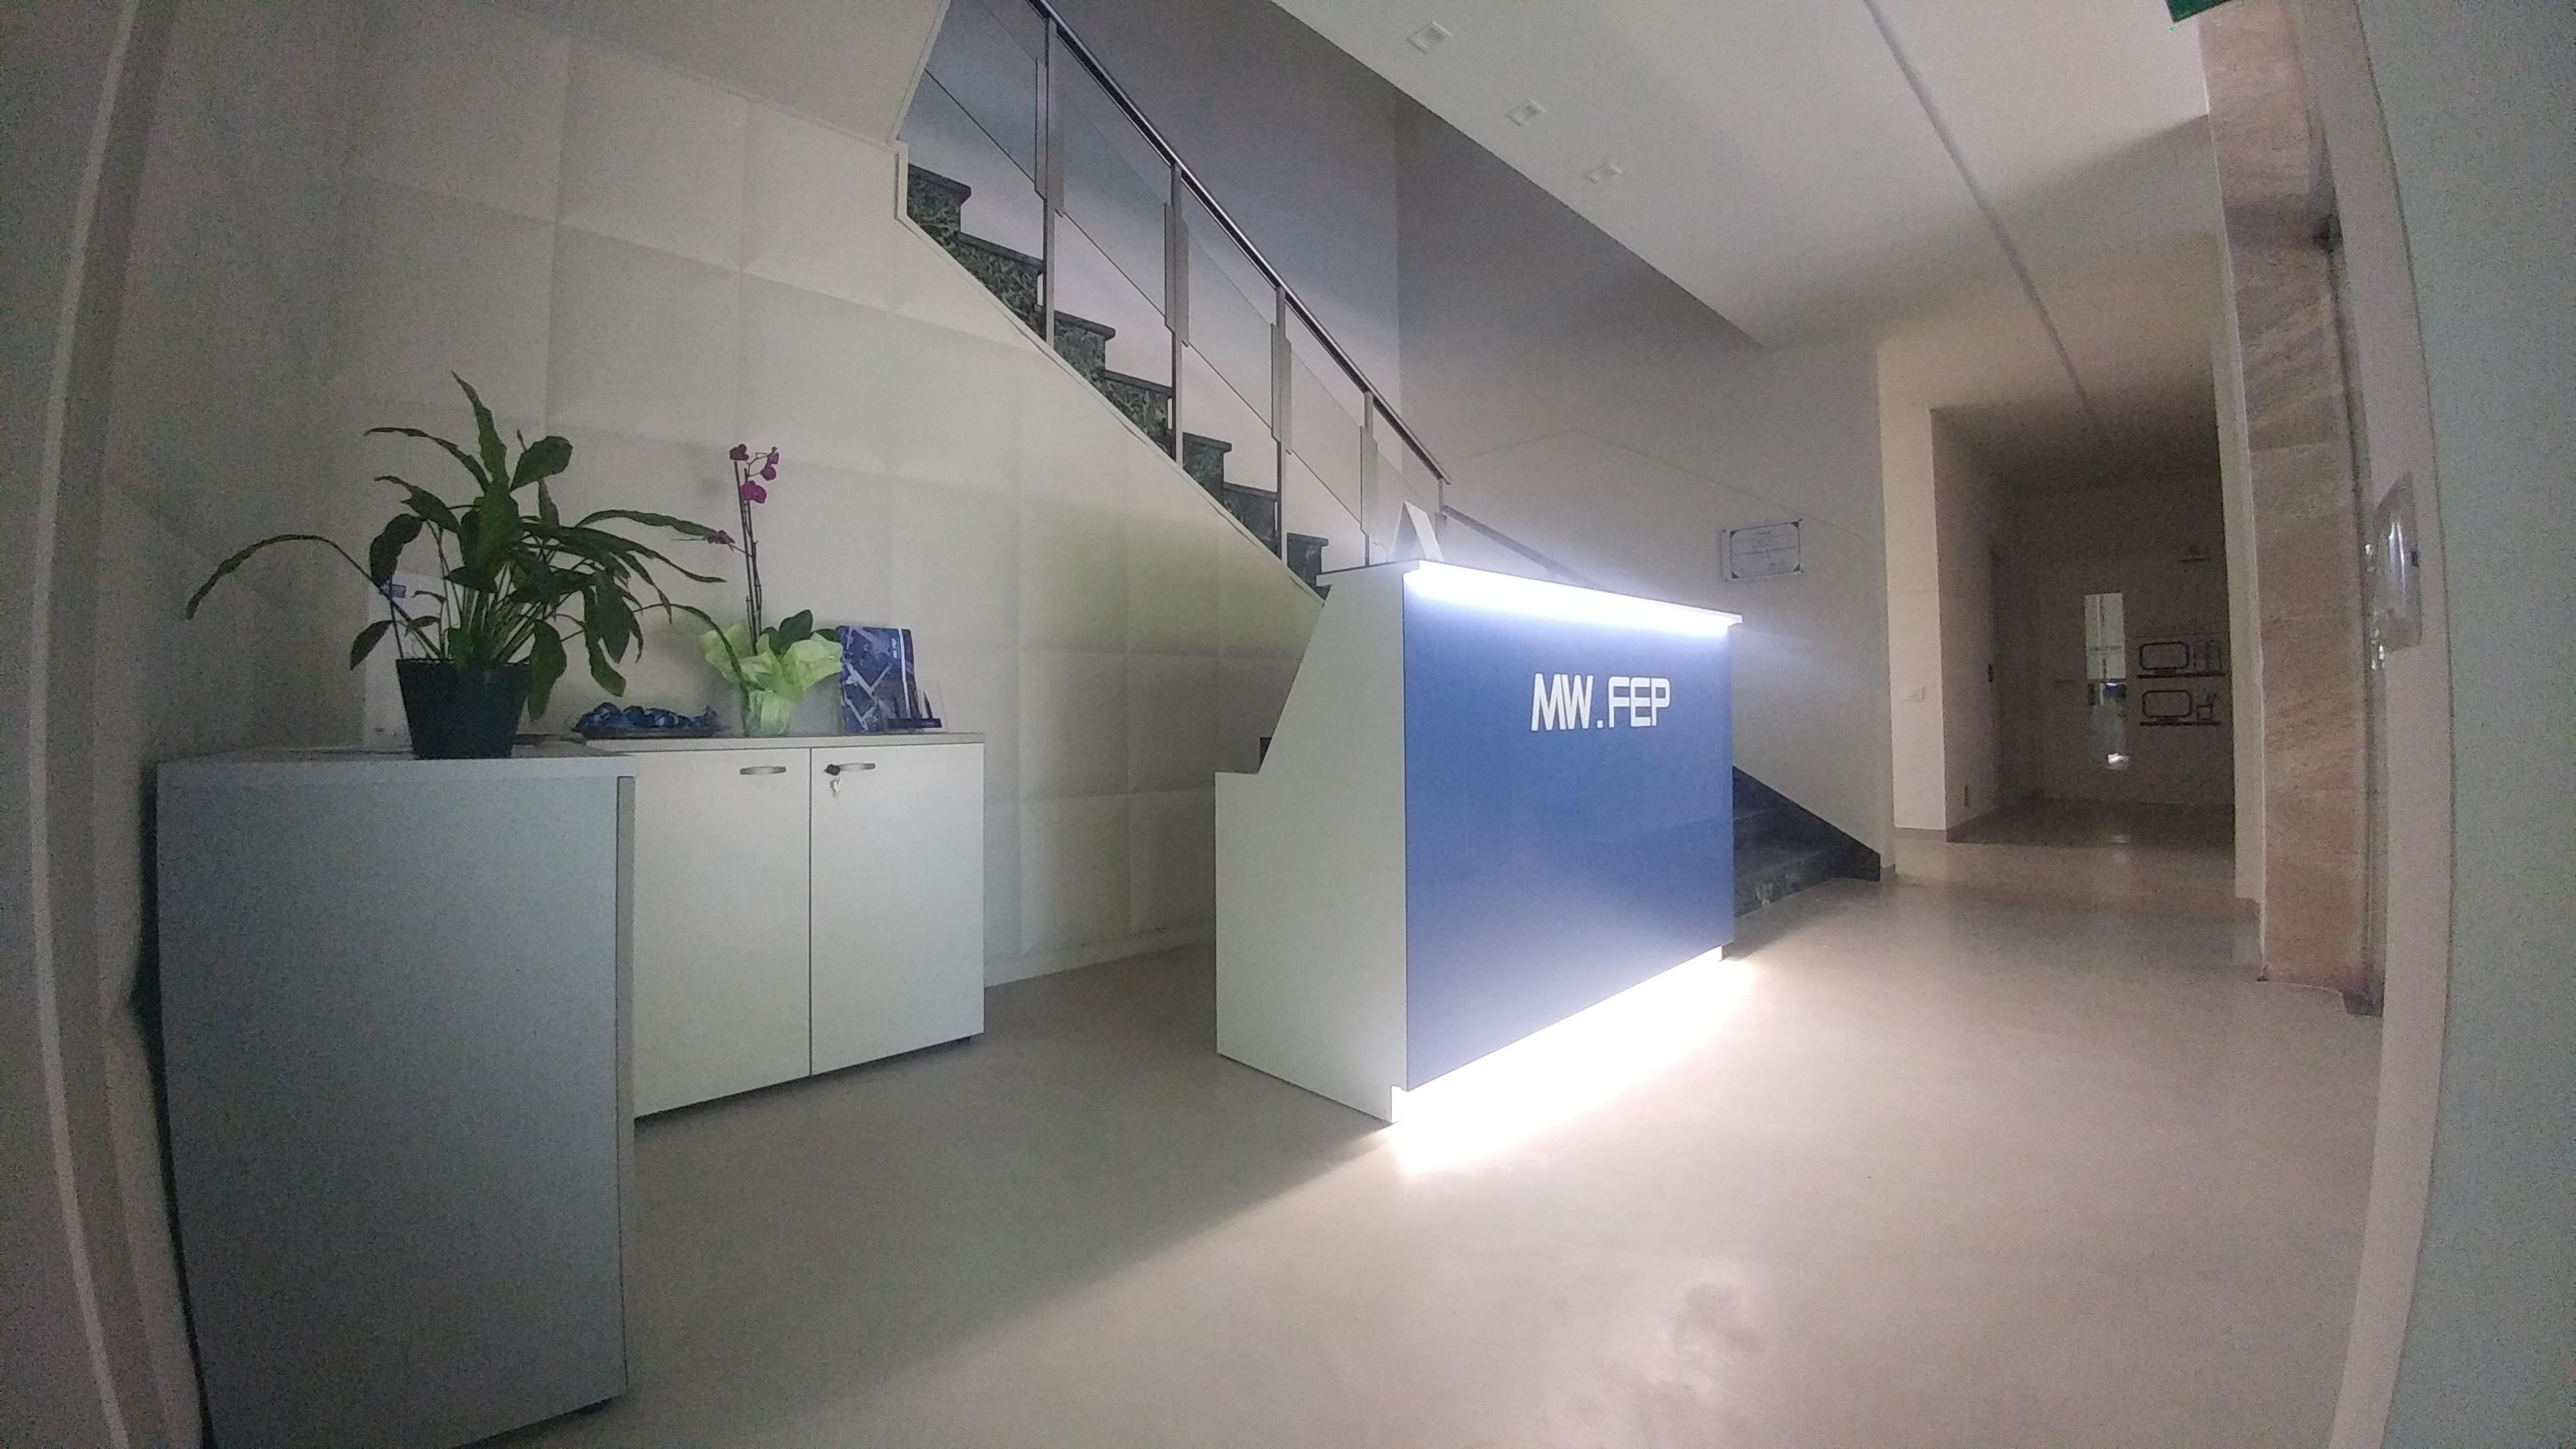 MW FEP